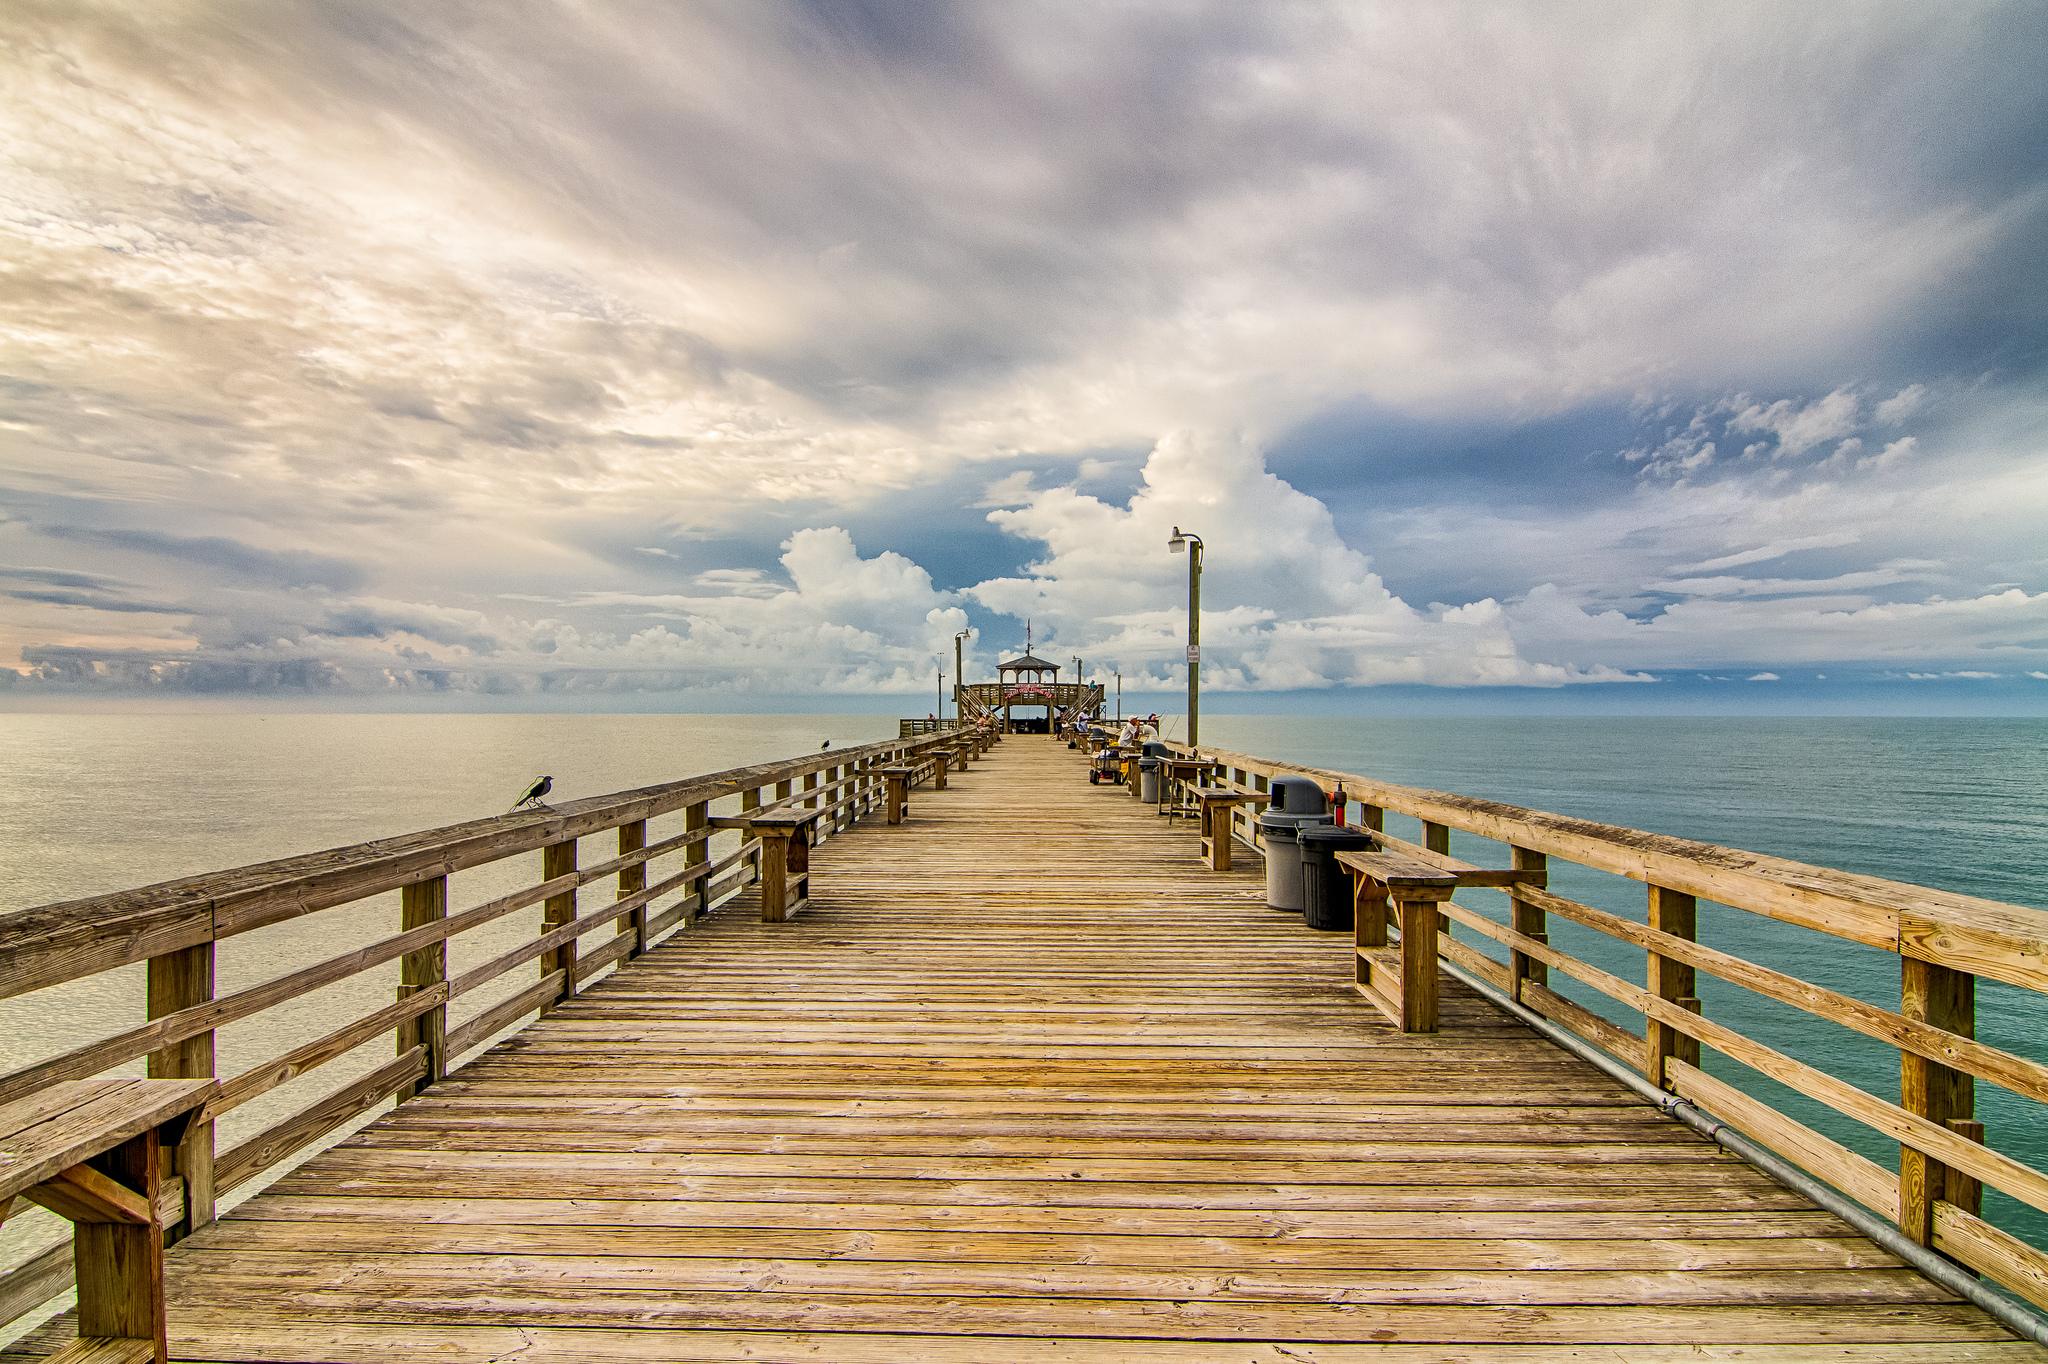 North Myrtle Beach Pictures